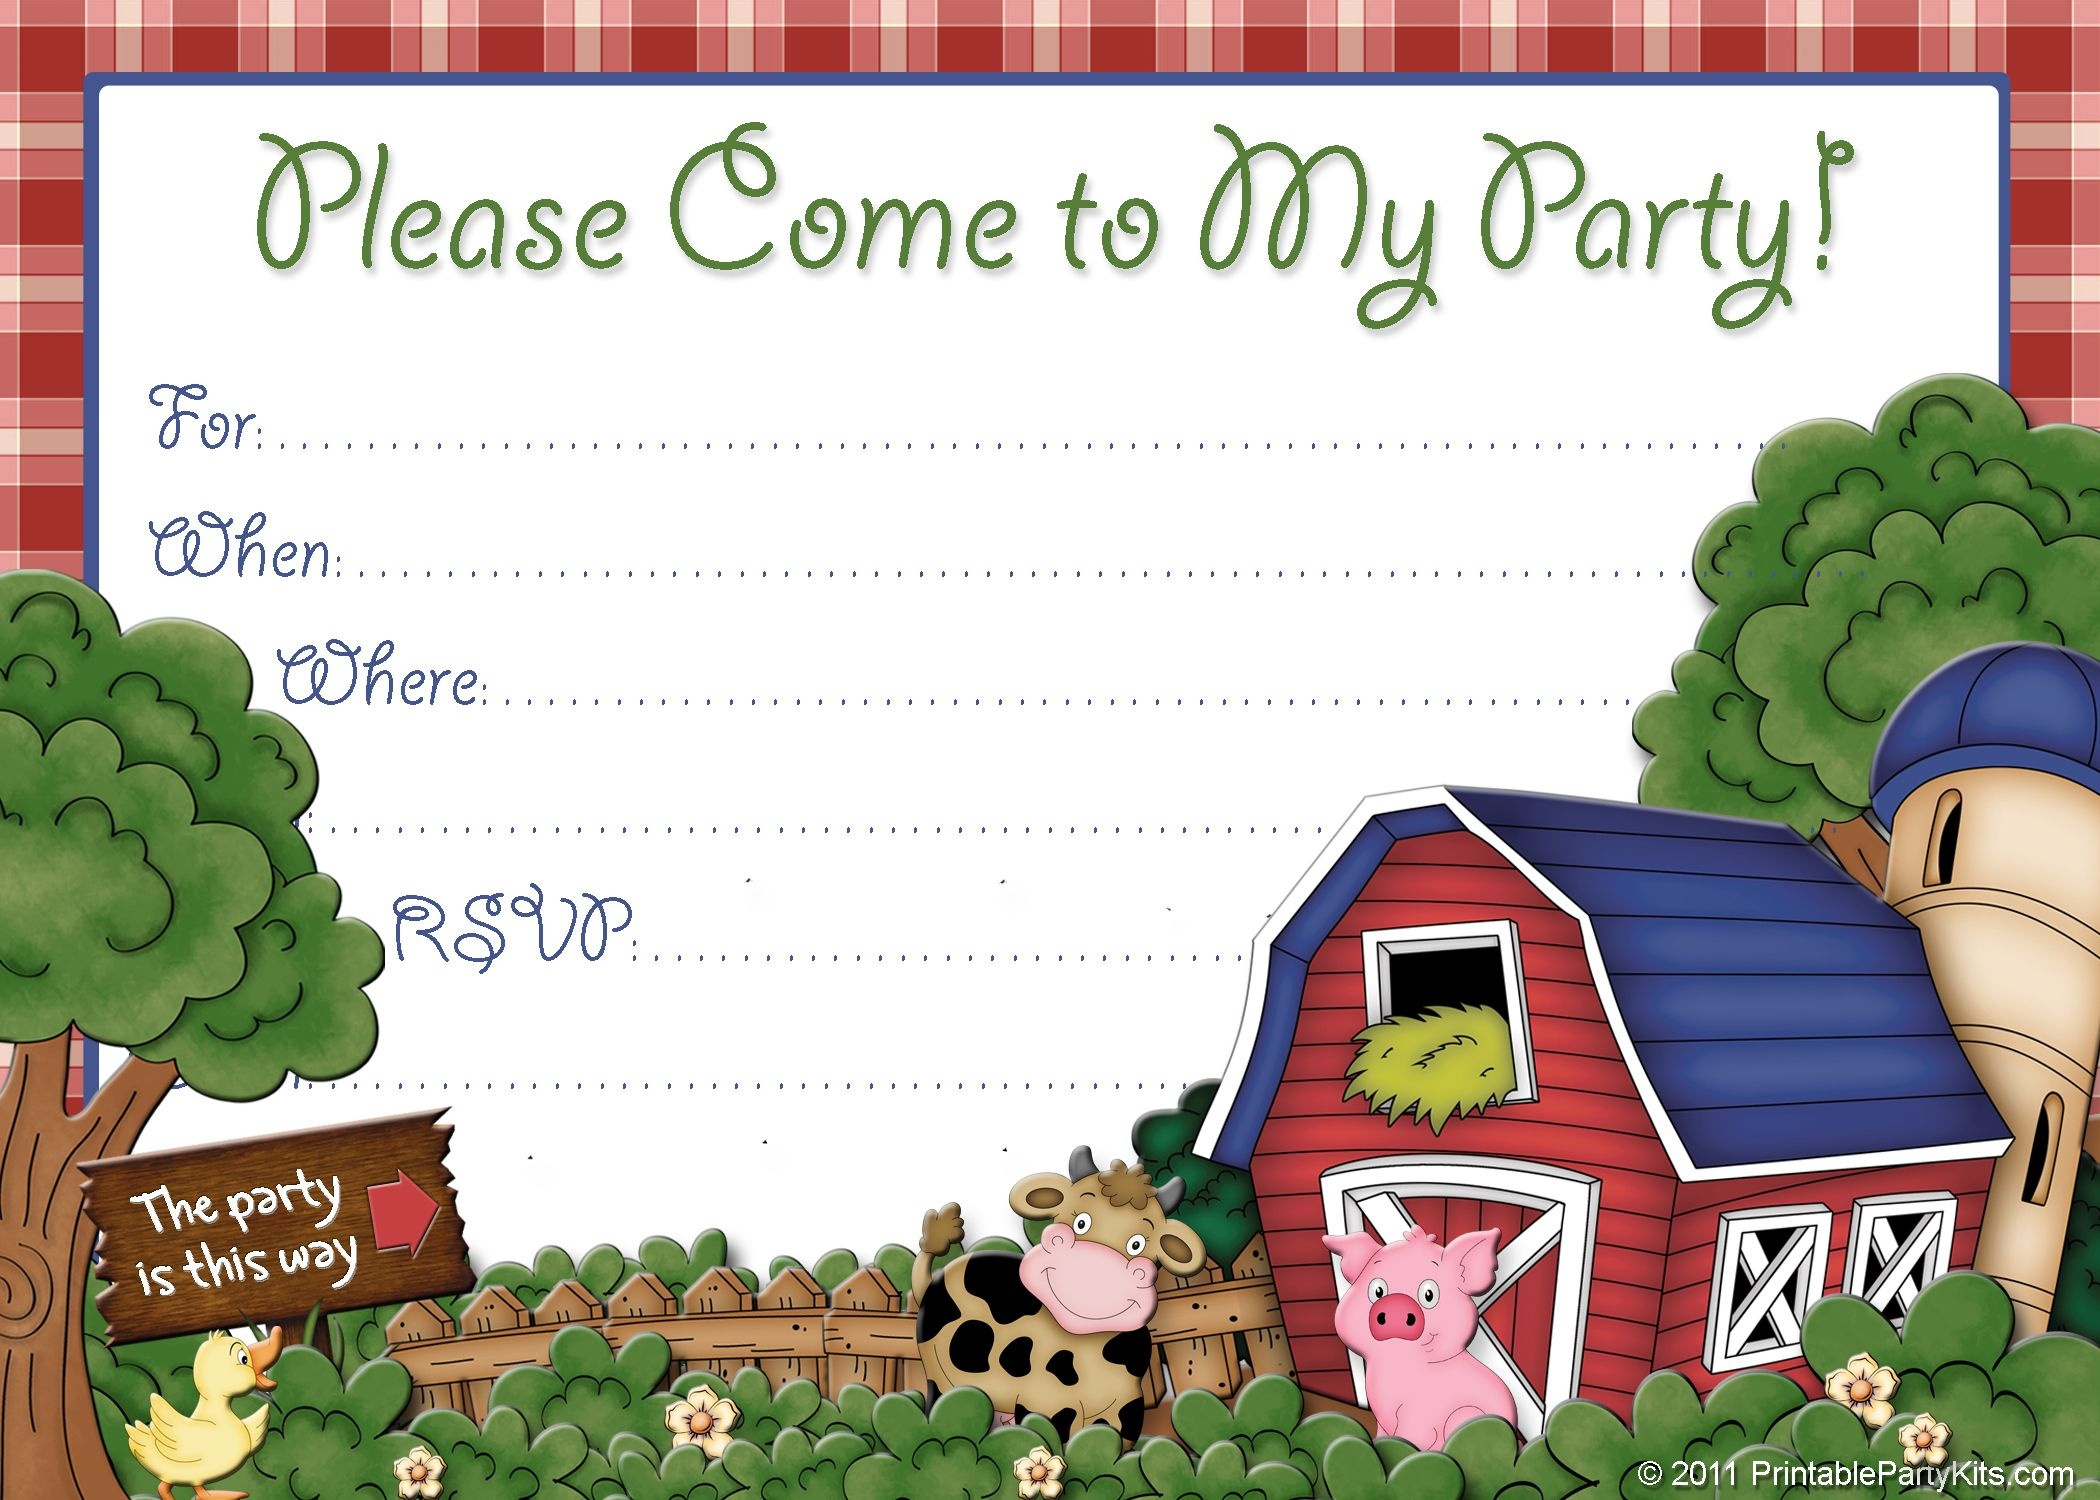 Free Printable Boys Birthday Party Invitations | Invitation Cards - Free Printable Farm Birthday Invitations